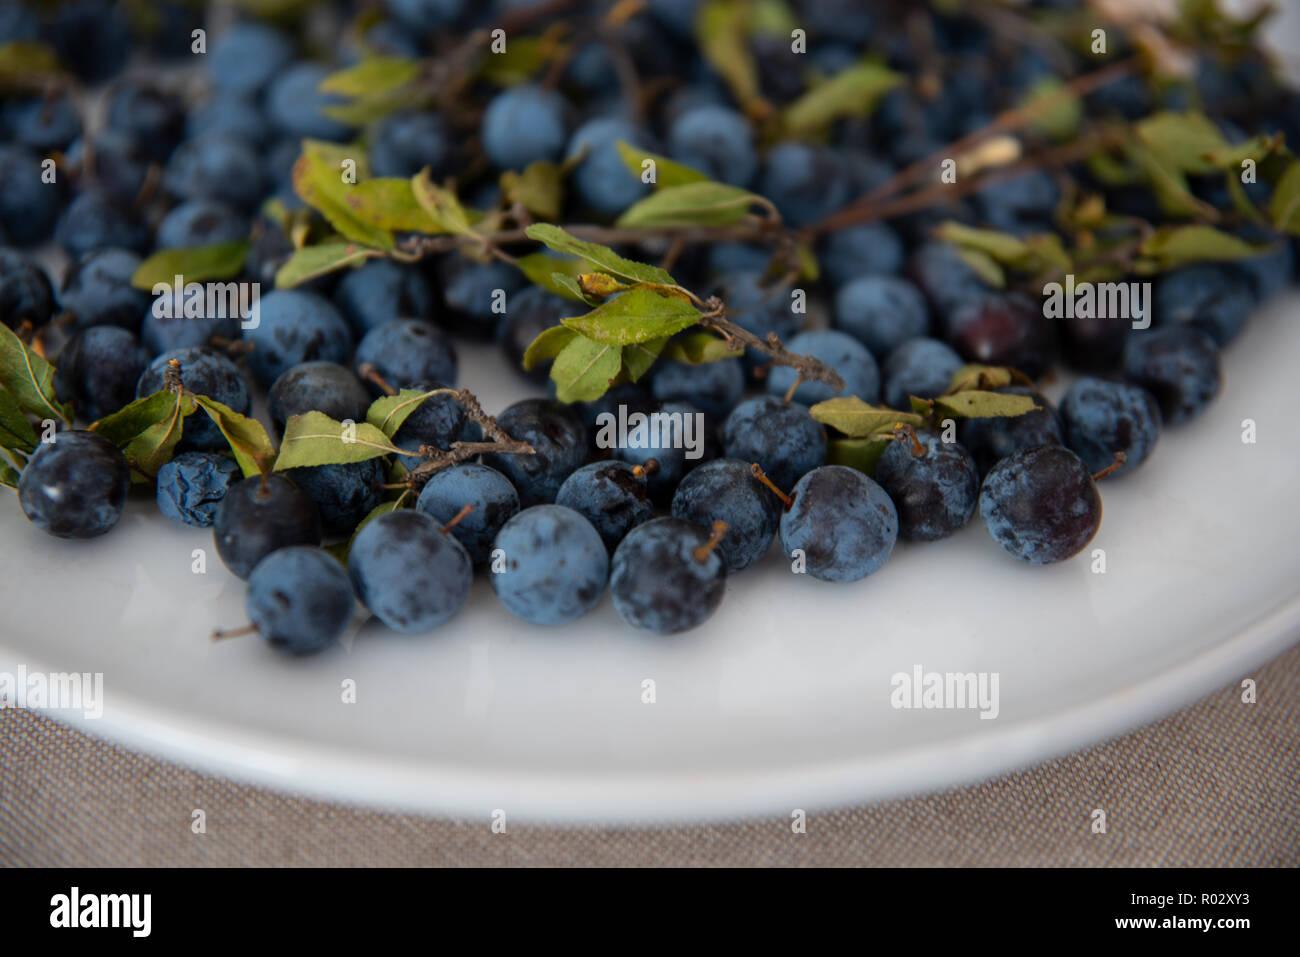 Mirtilli - Stock Image